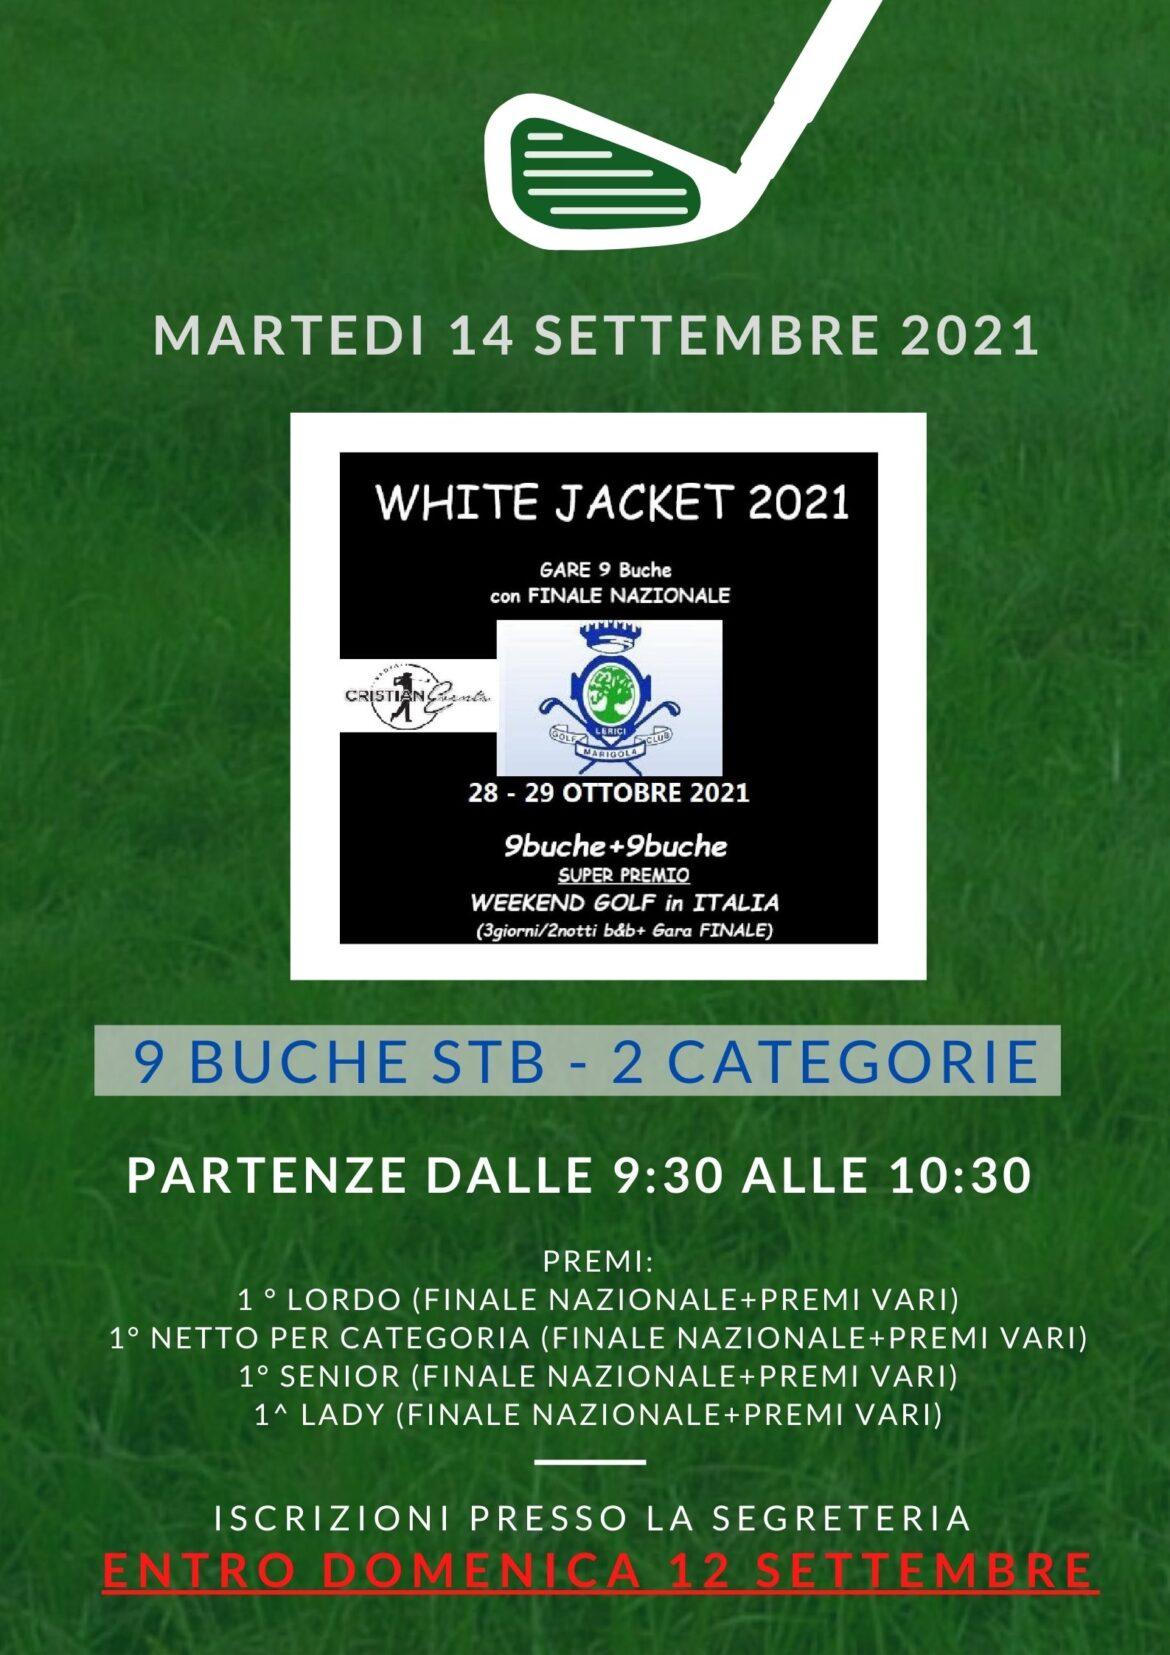 WHITE JACKET by Nuova Cristianevents – 14 settembre 2021